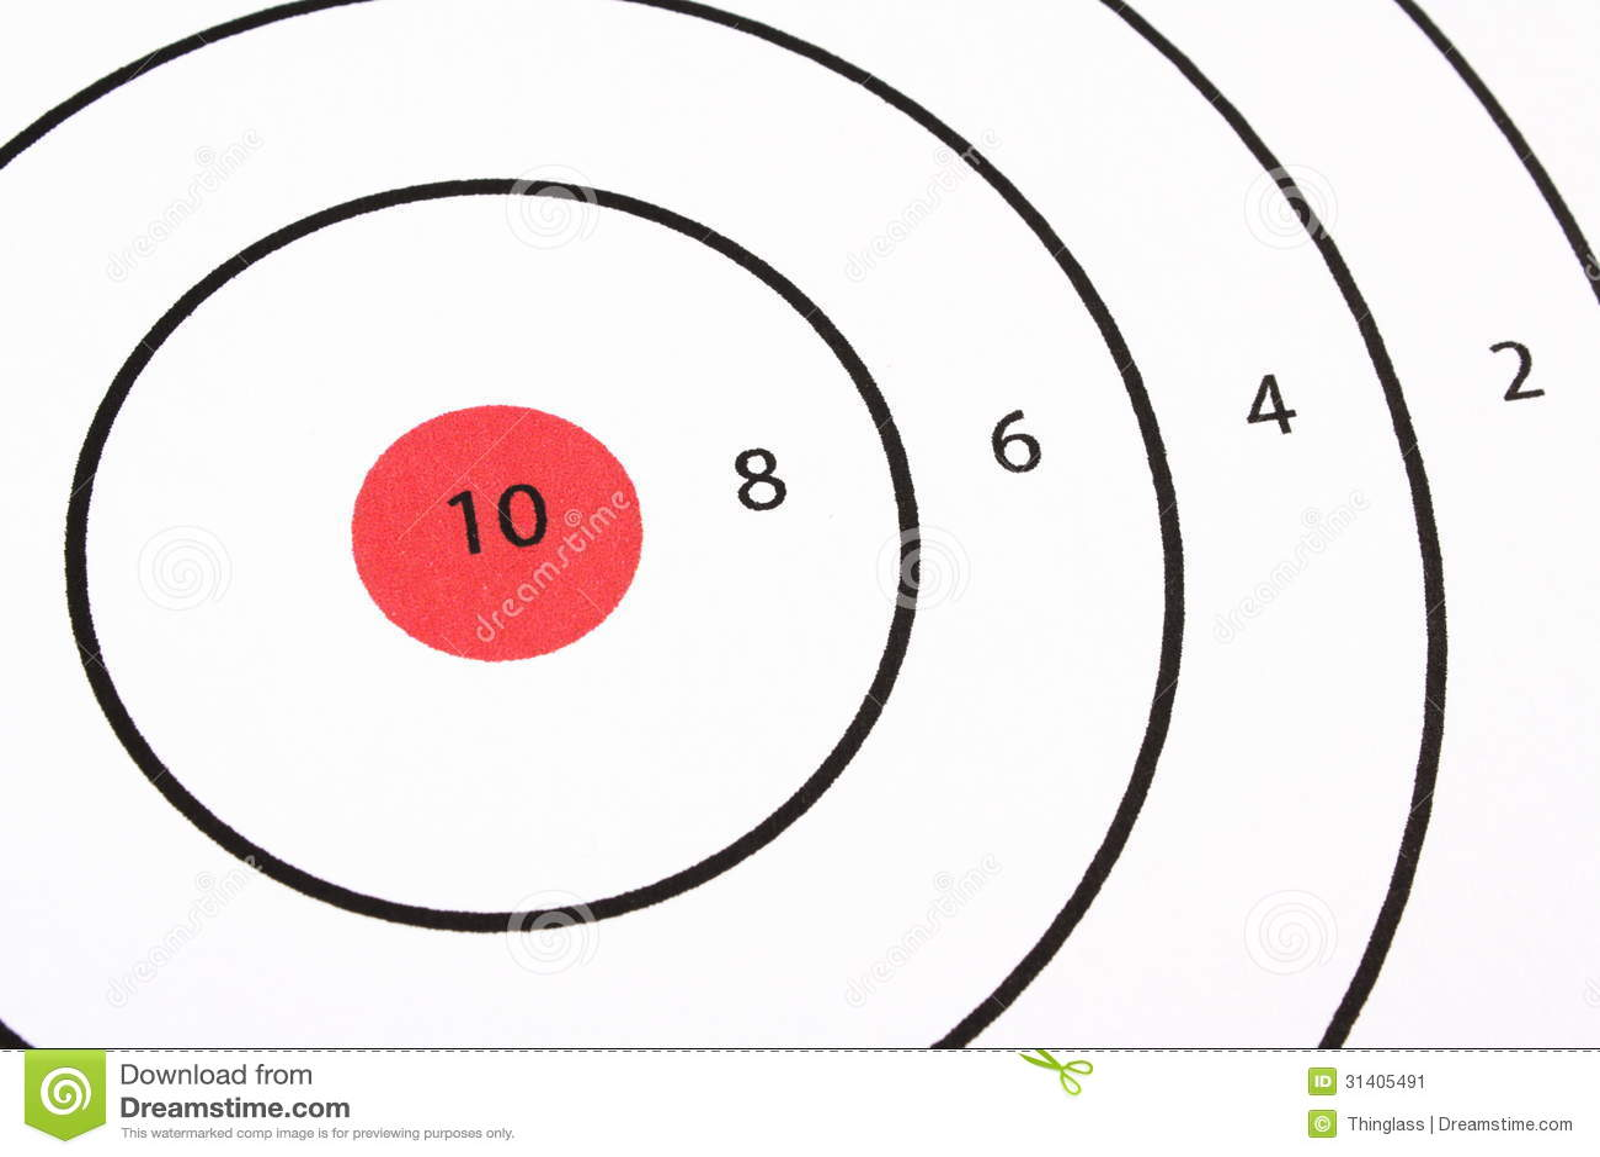 Bullseye target shooting target bullseye